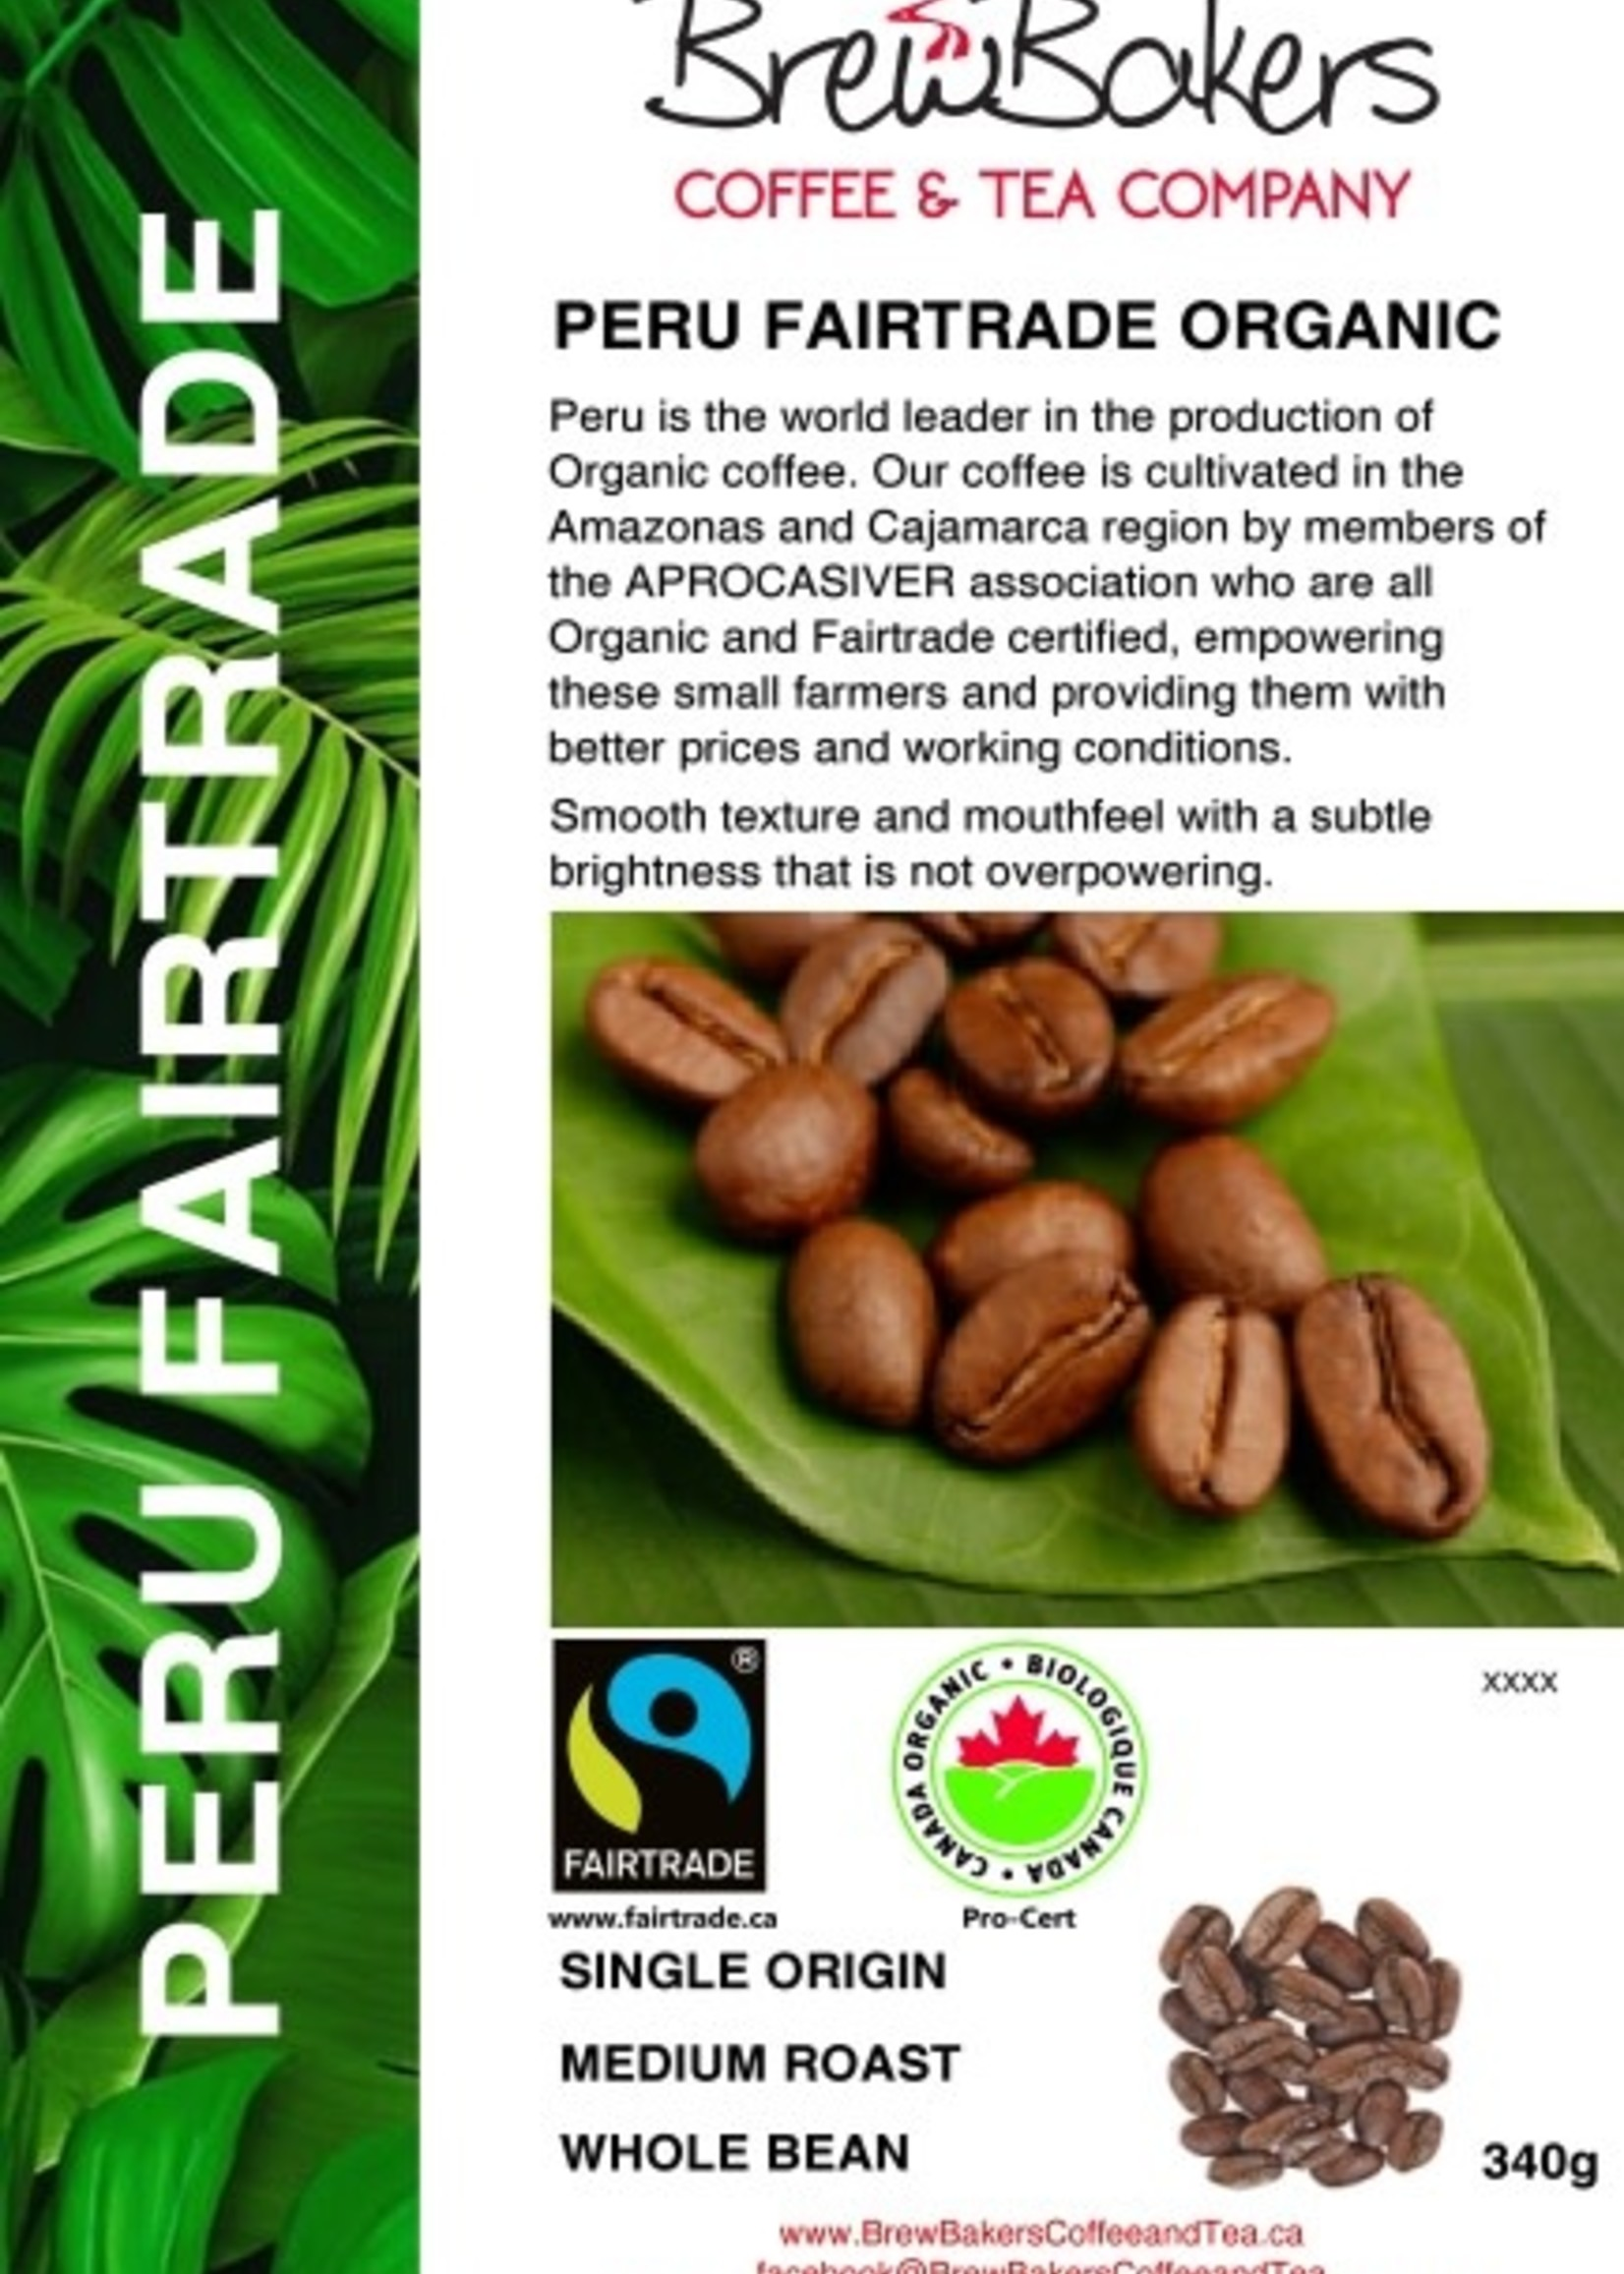 BrewBakers Coffee Bean Peru FTO 340g